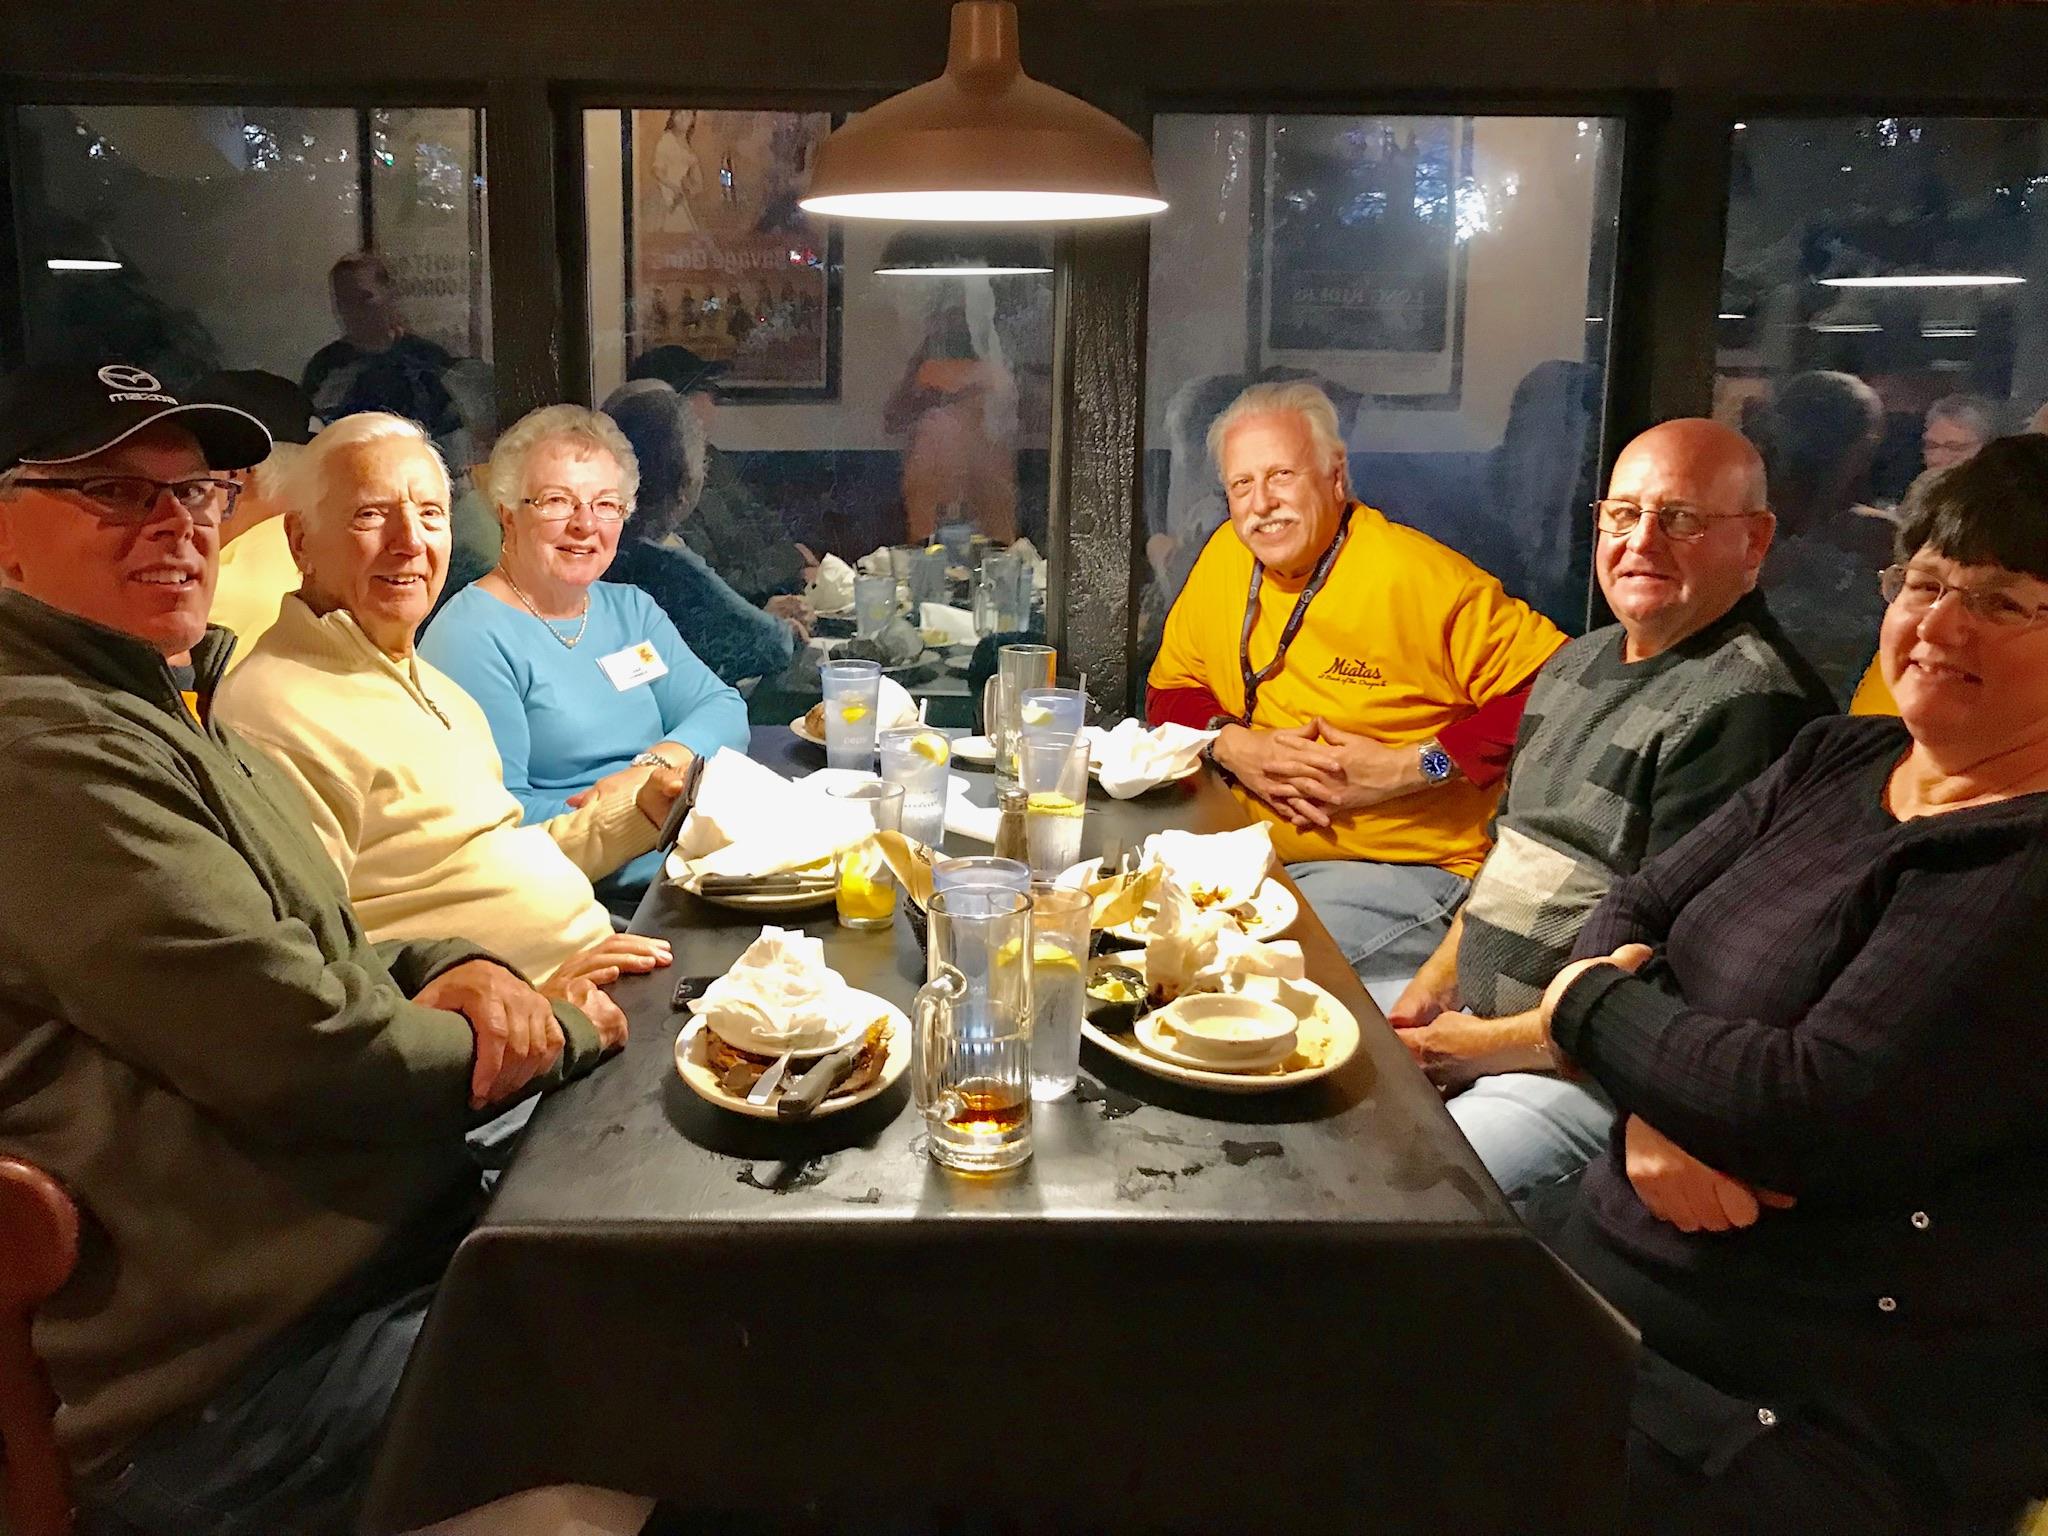 Saturday dinner at Sagebrush. Clockwise from left: Tracy Brown, Bill & Lana Horneck, Ken Ingram, Tom & Tammy Hickle.